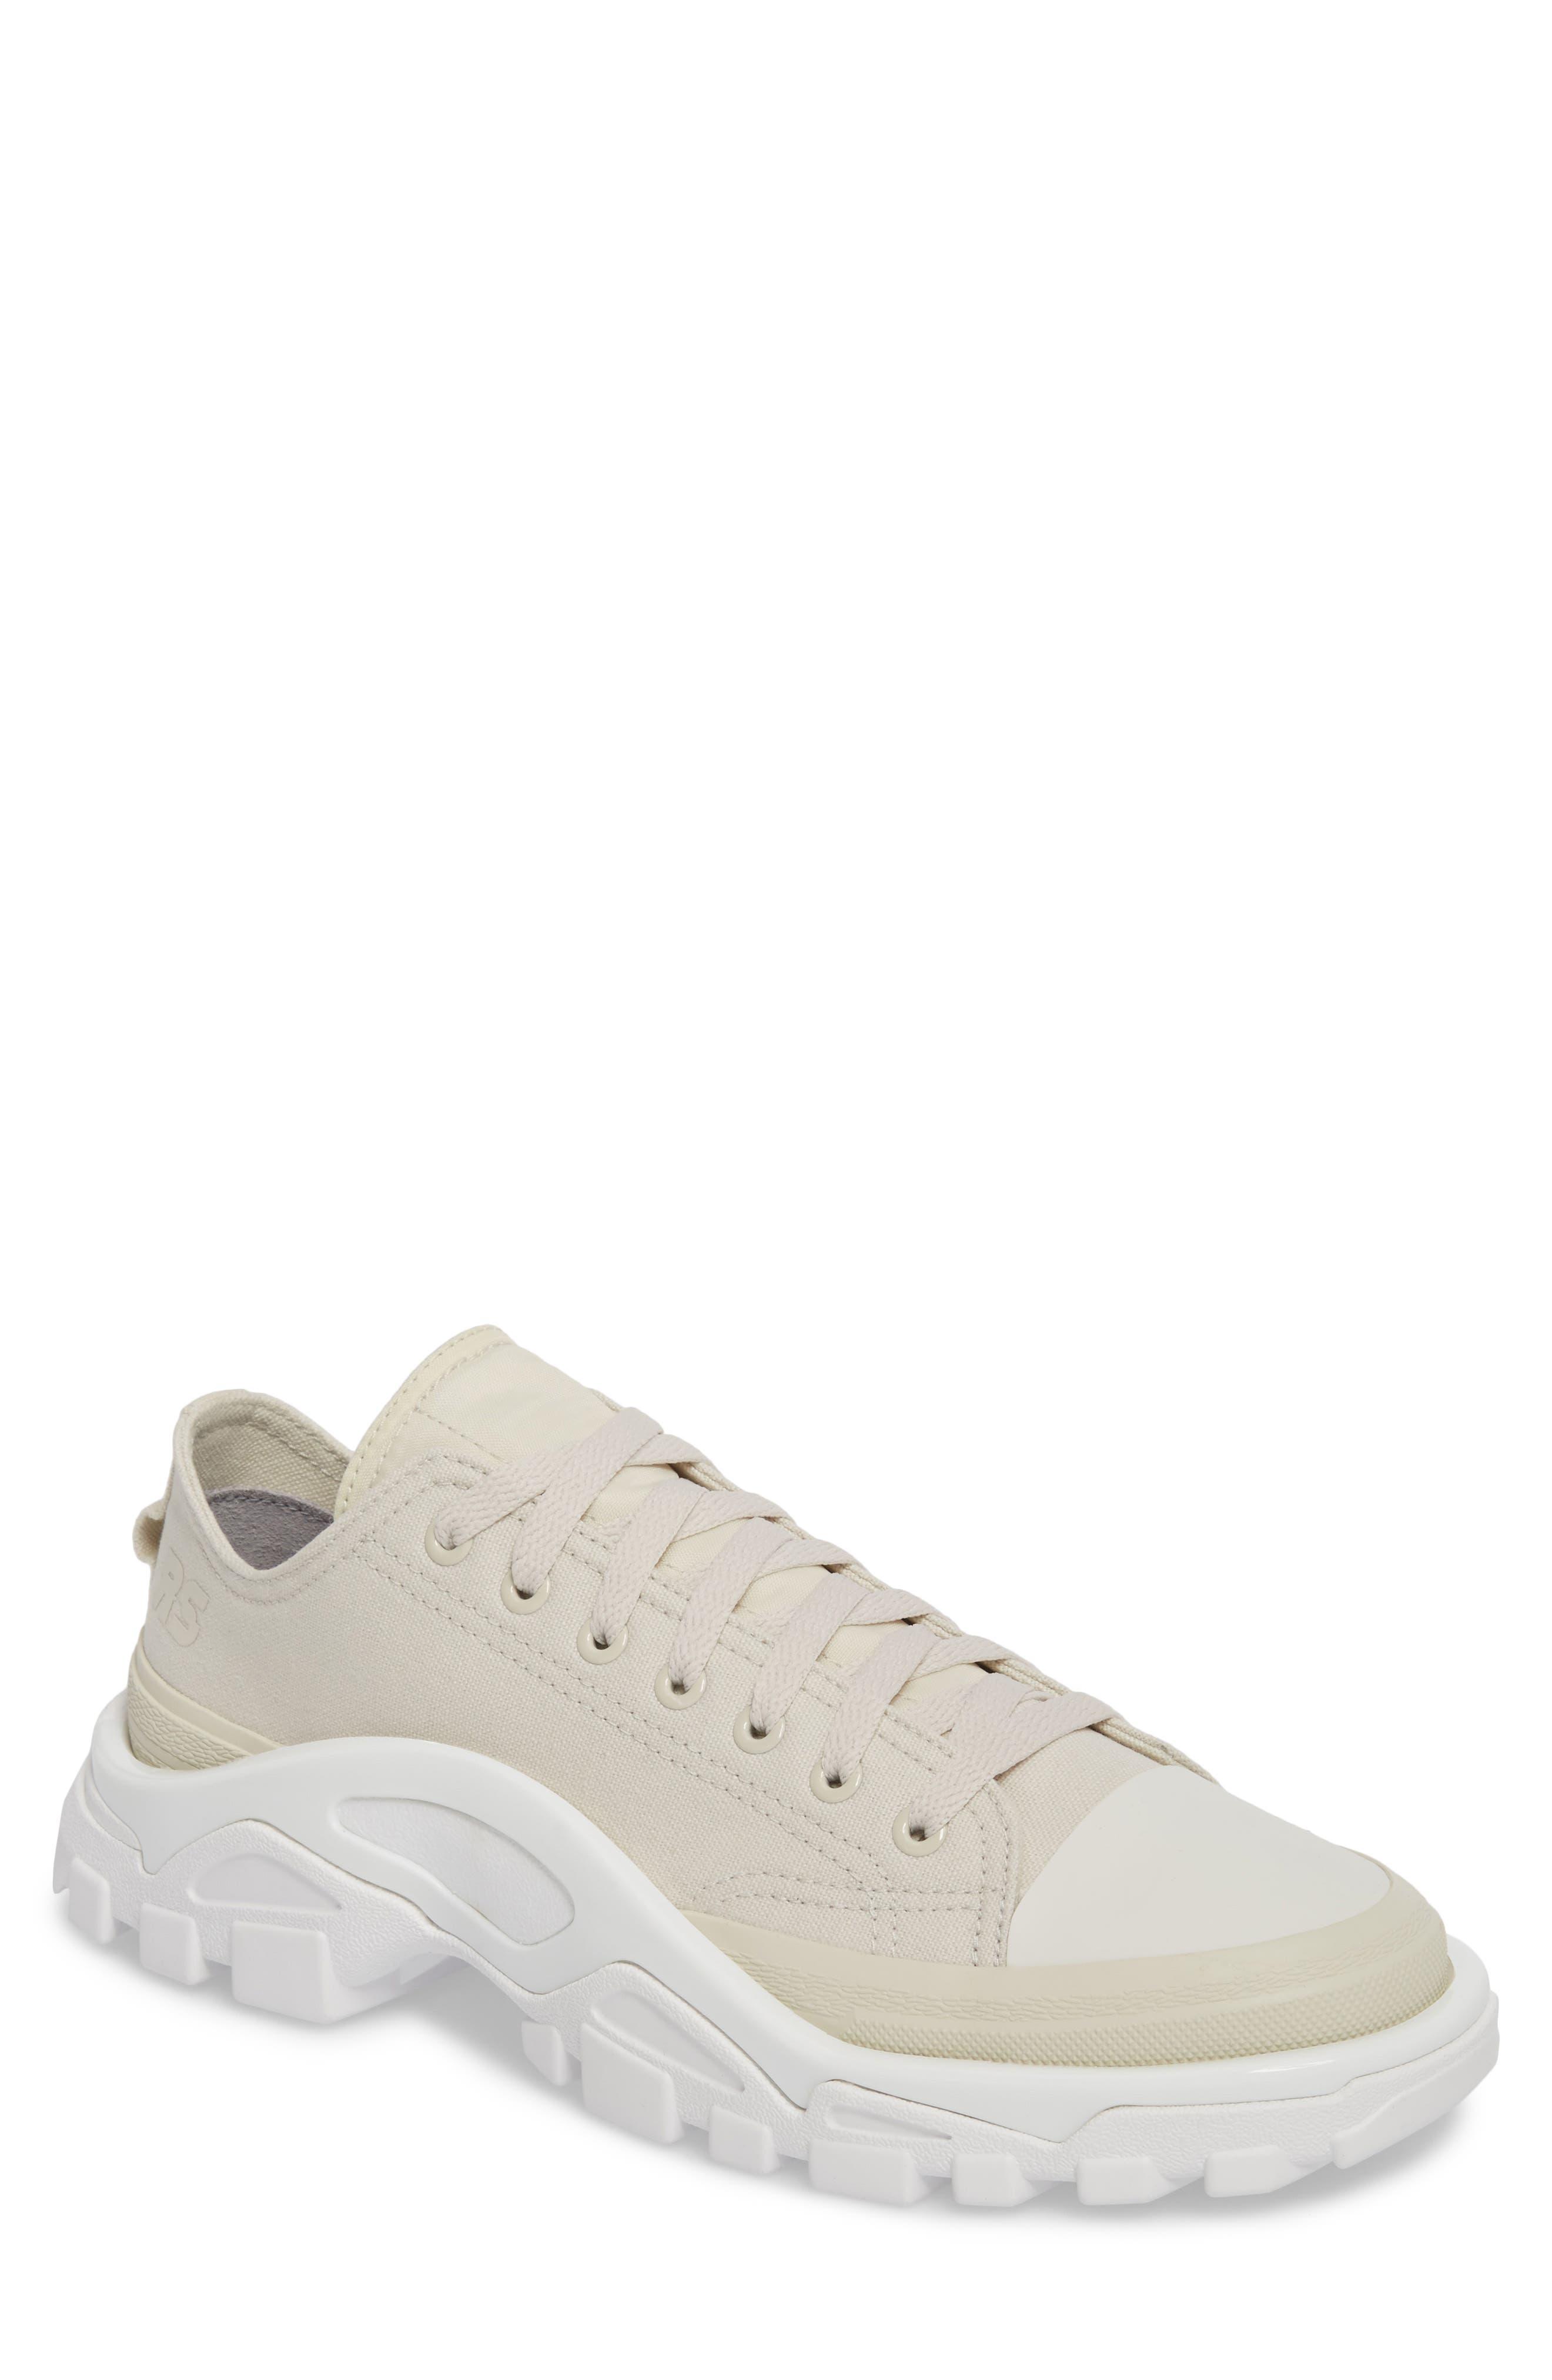 Detroit Low Top Sneaker,                         Main,                         color, Beige/ White